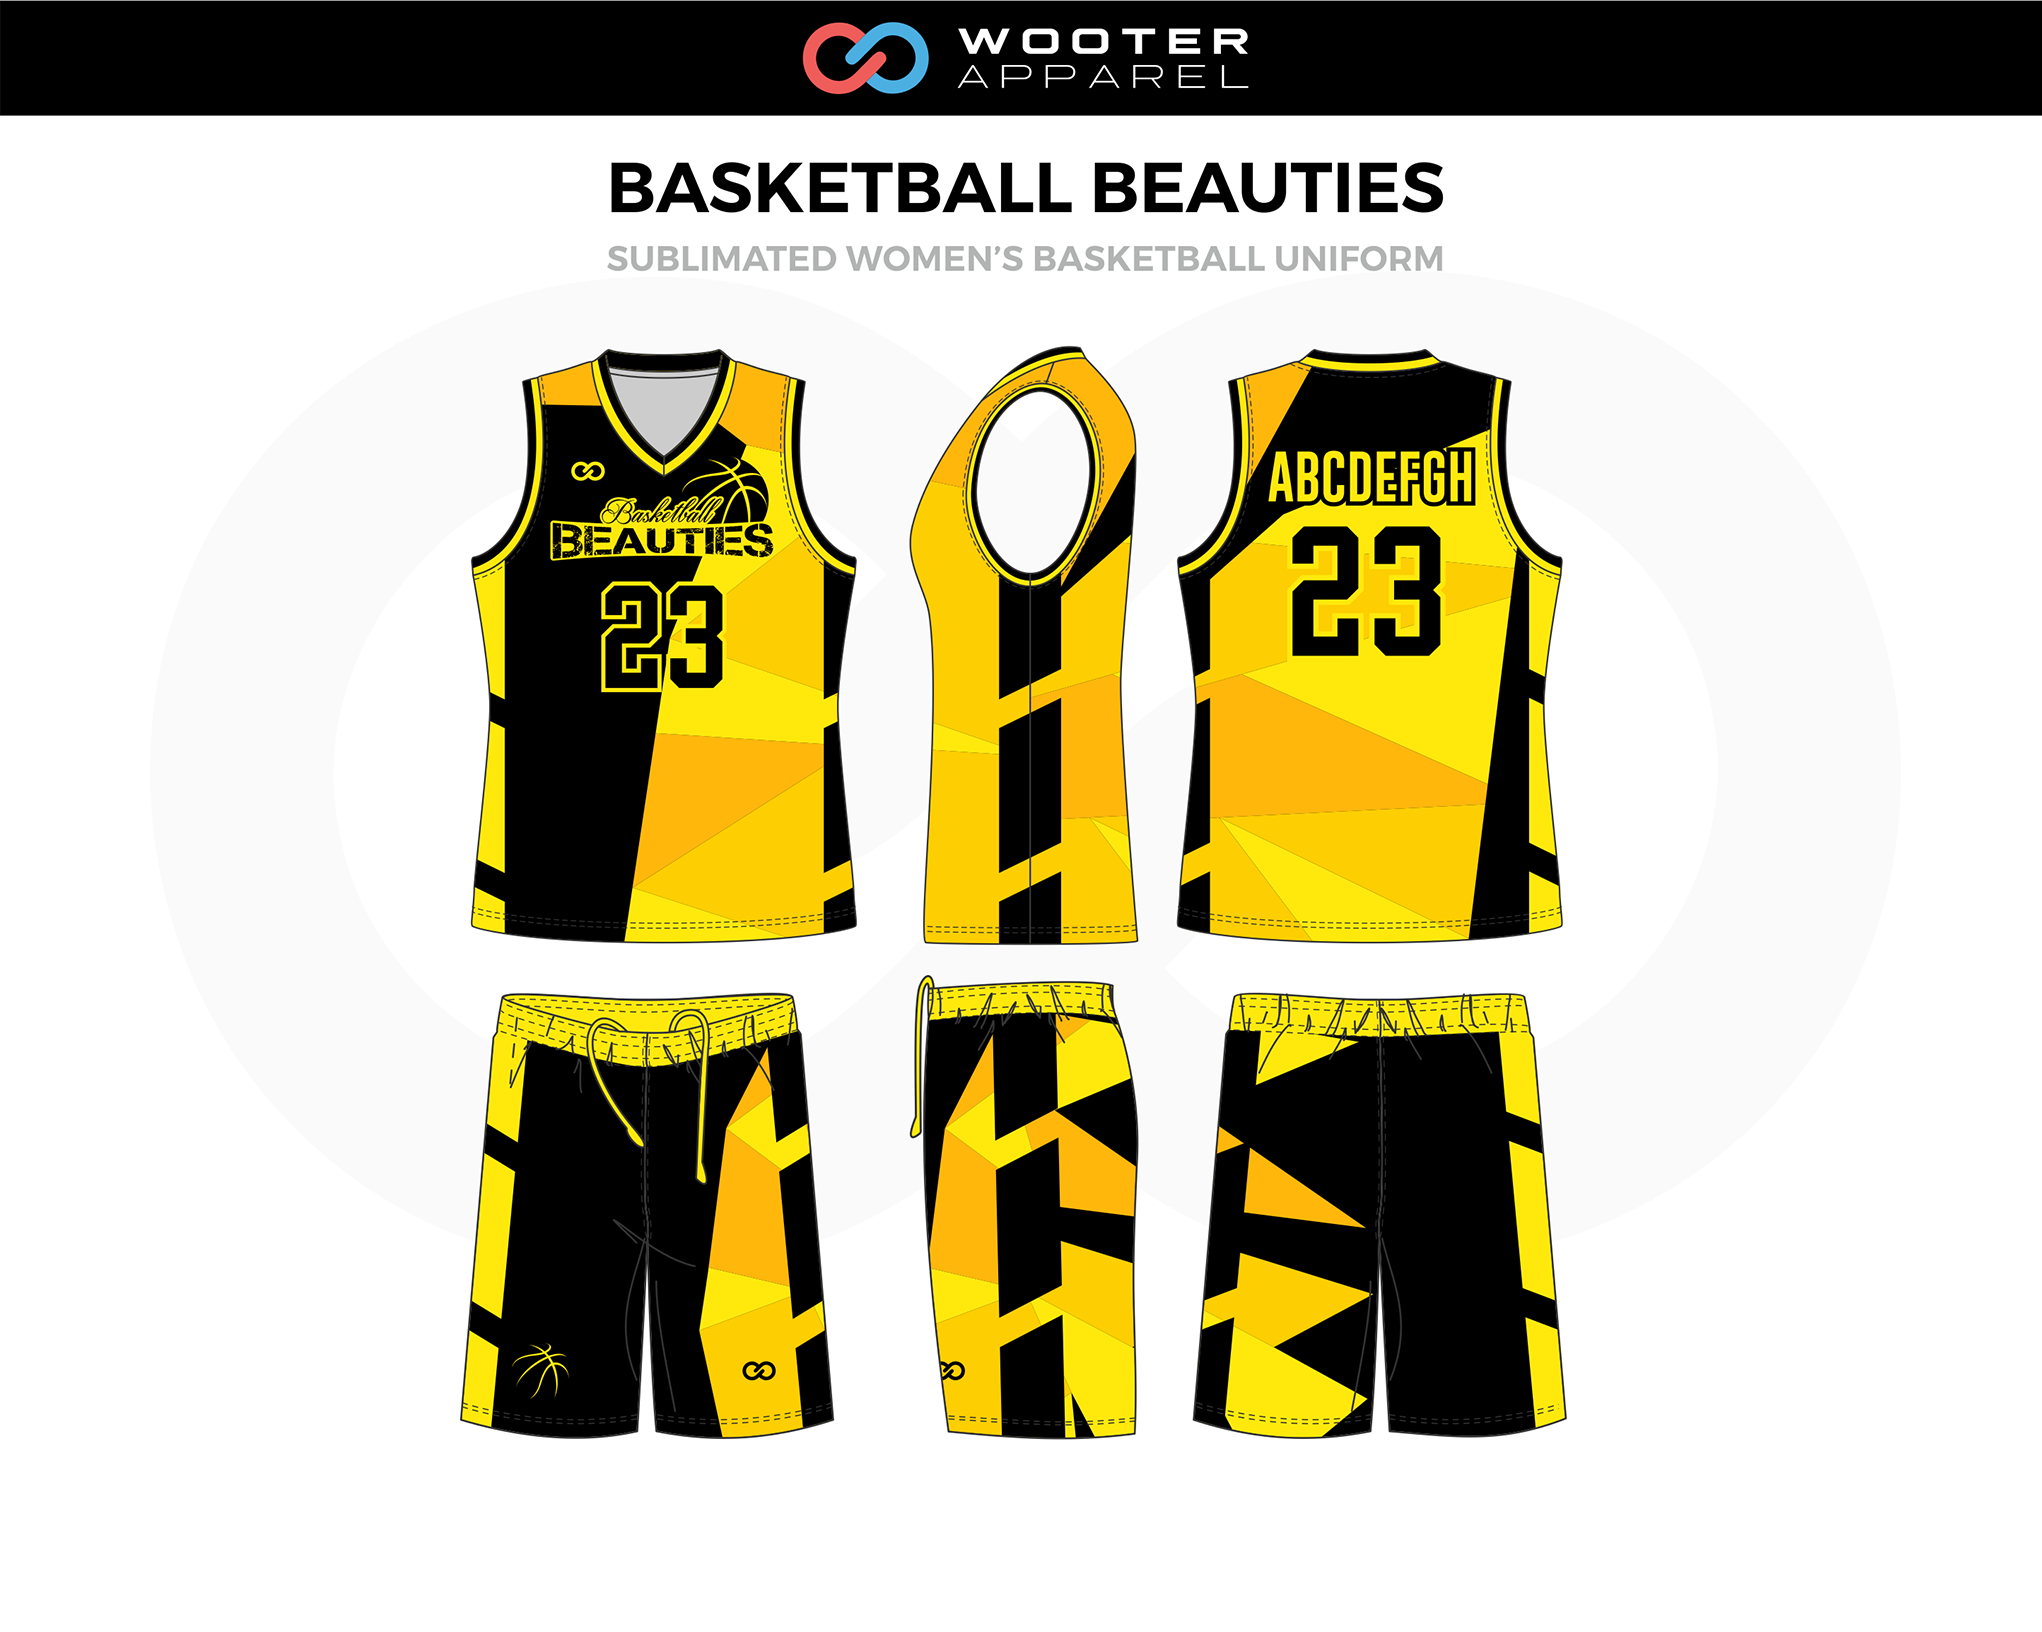 BASKETBALL BEAUTIES Black Yellow Women's Basketball Uniform, Jersey and Shorts